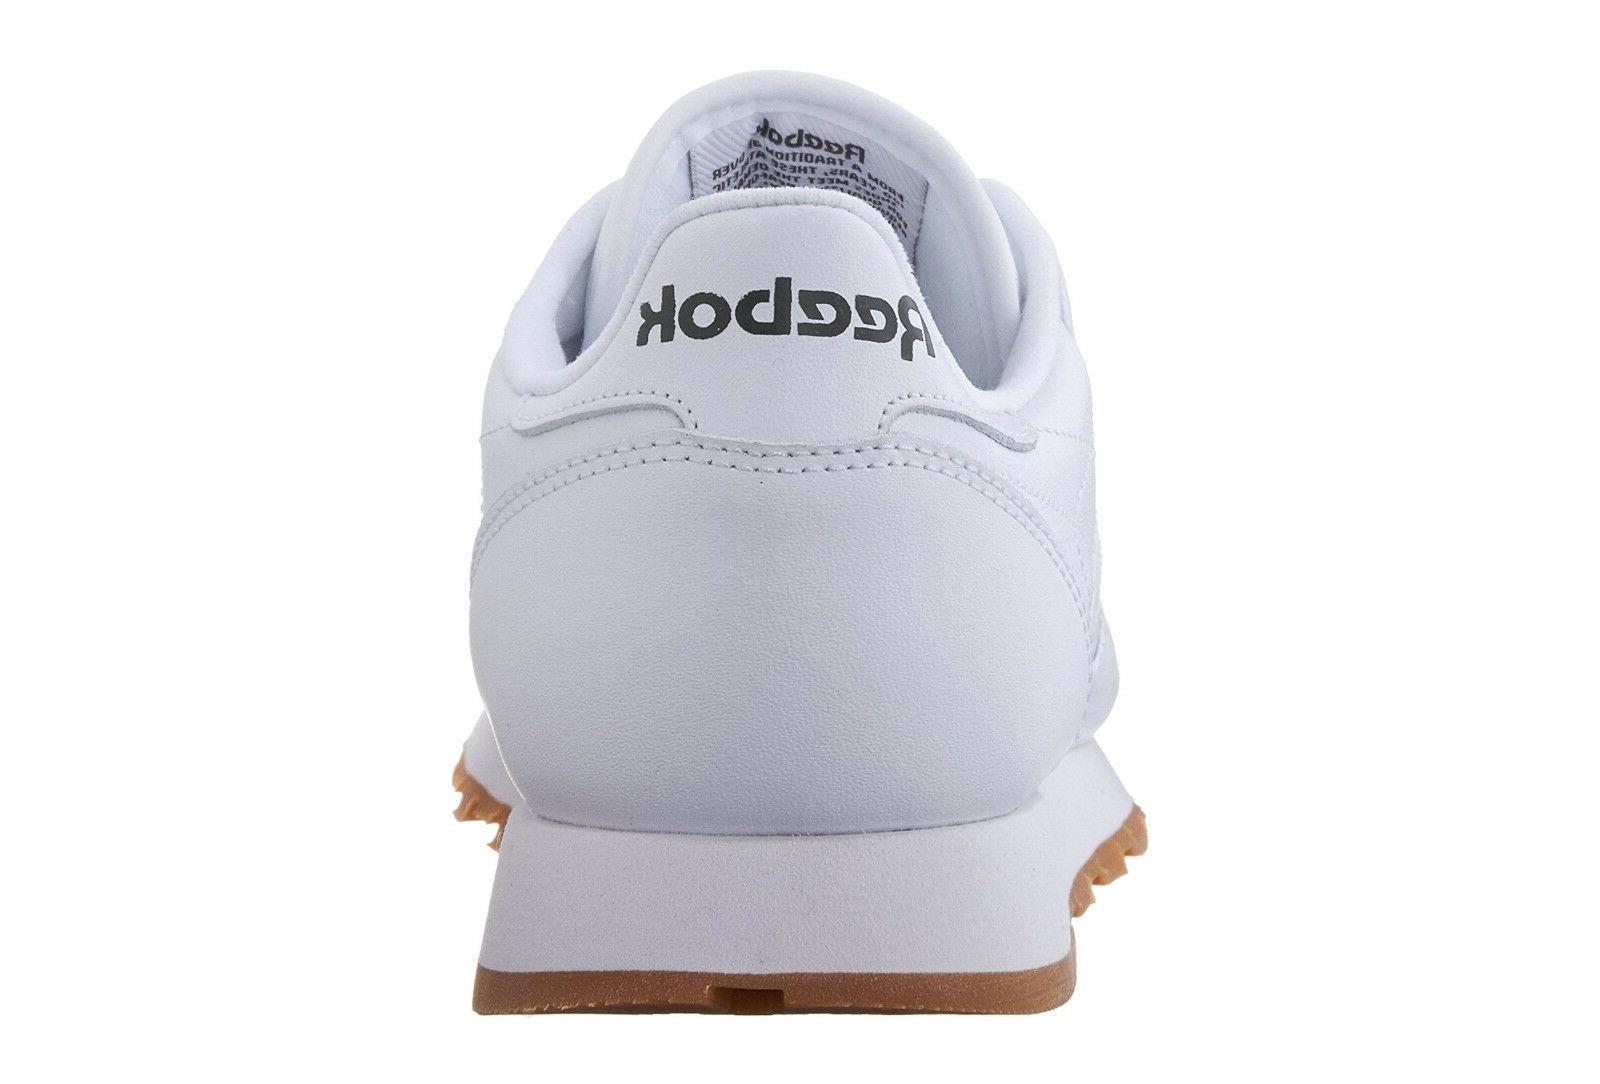 Reebok Classic White, Gum Mens Shoes Item